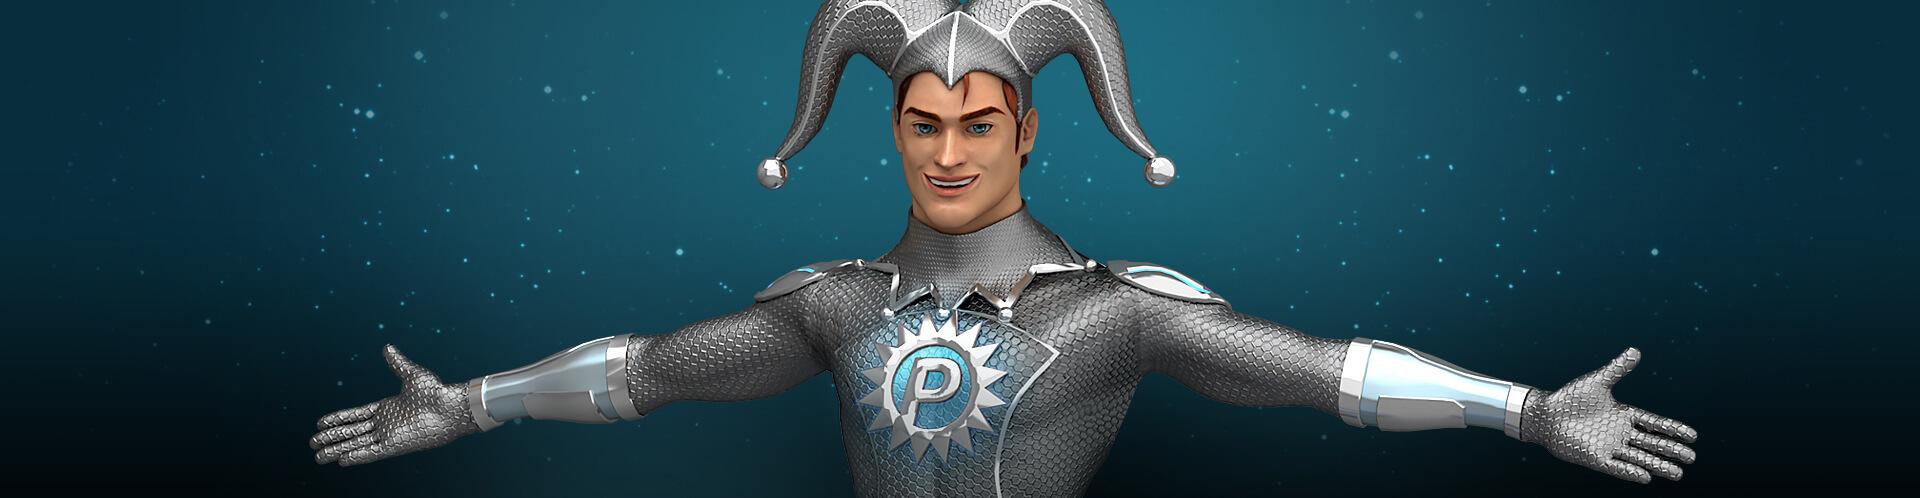 Platincasino Mascot Cover